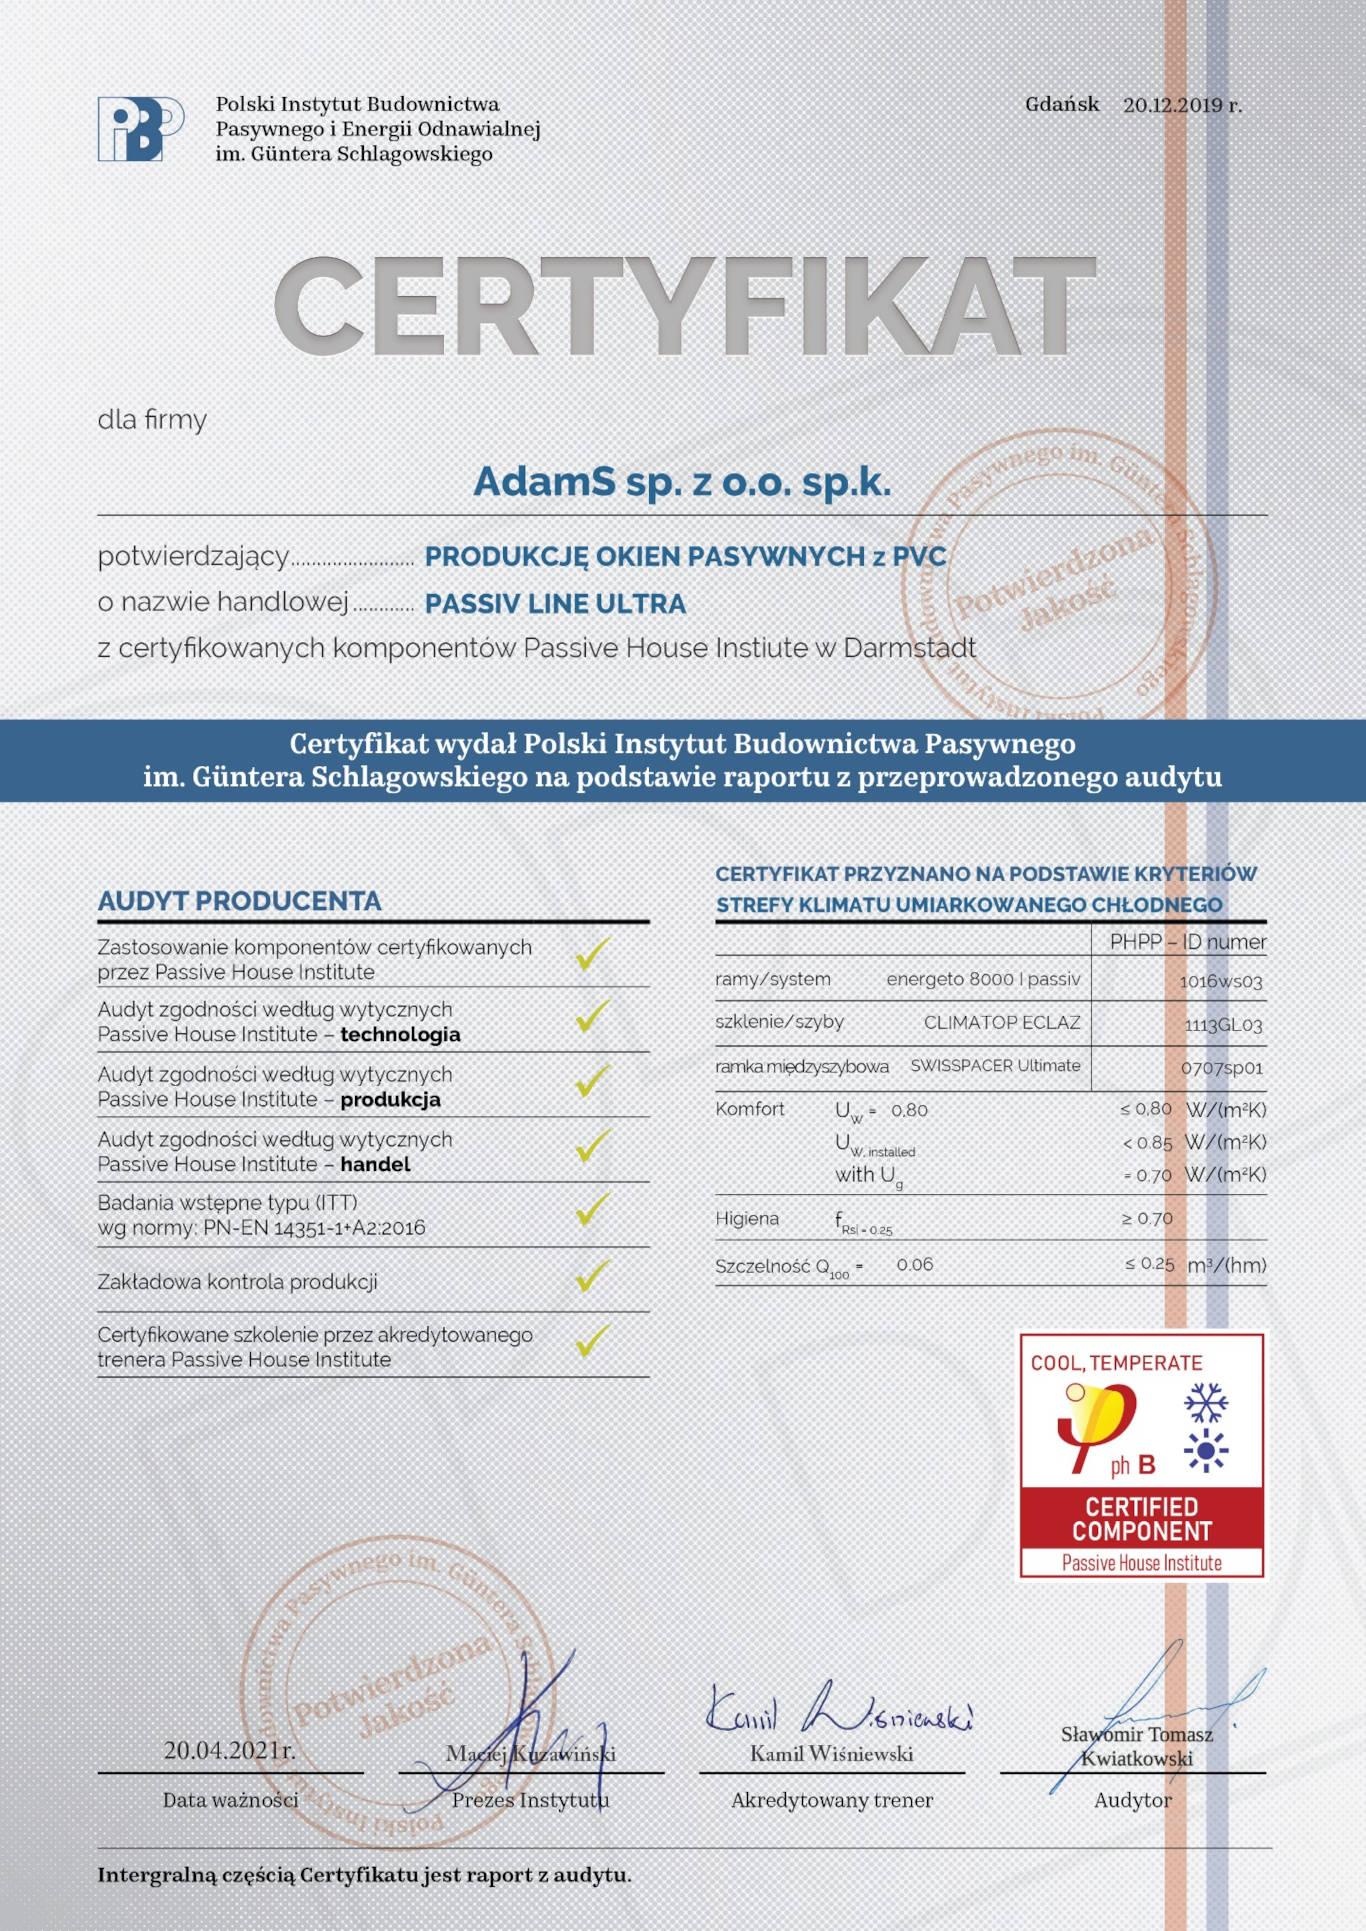 Certyfikat Komponentu Pasywnego